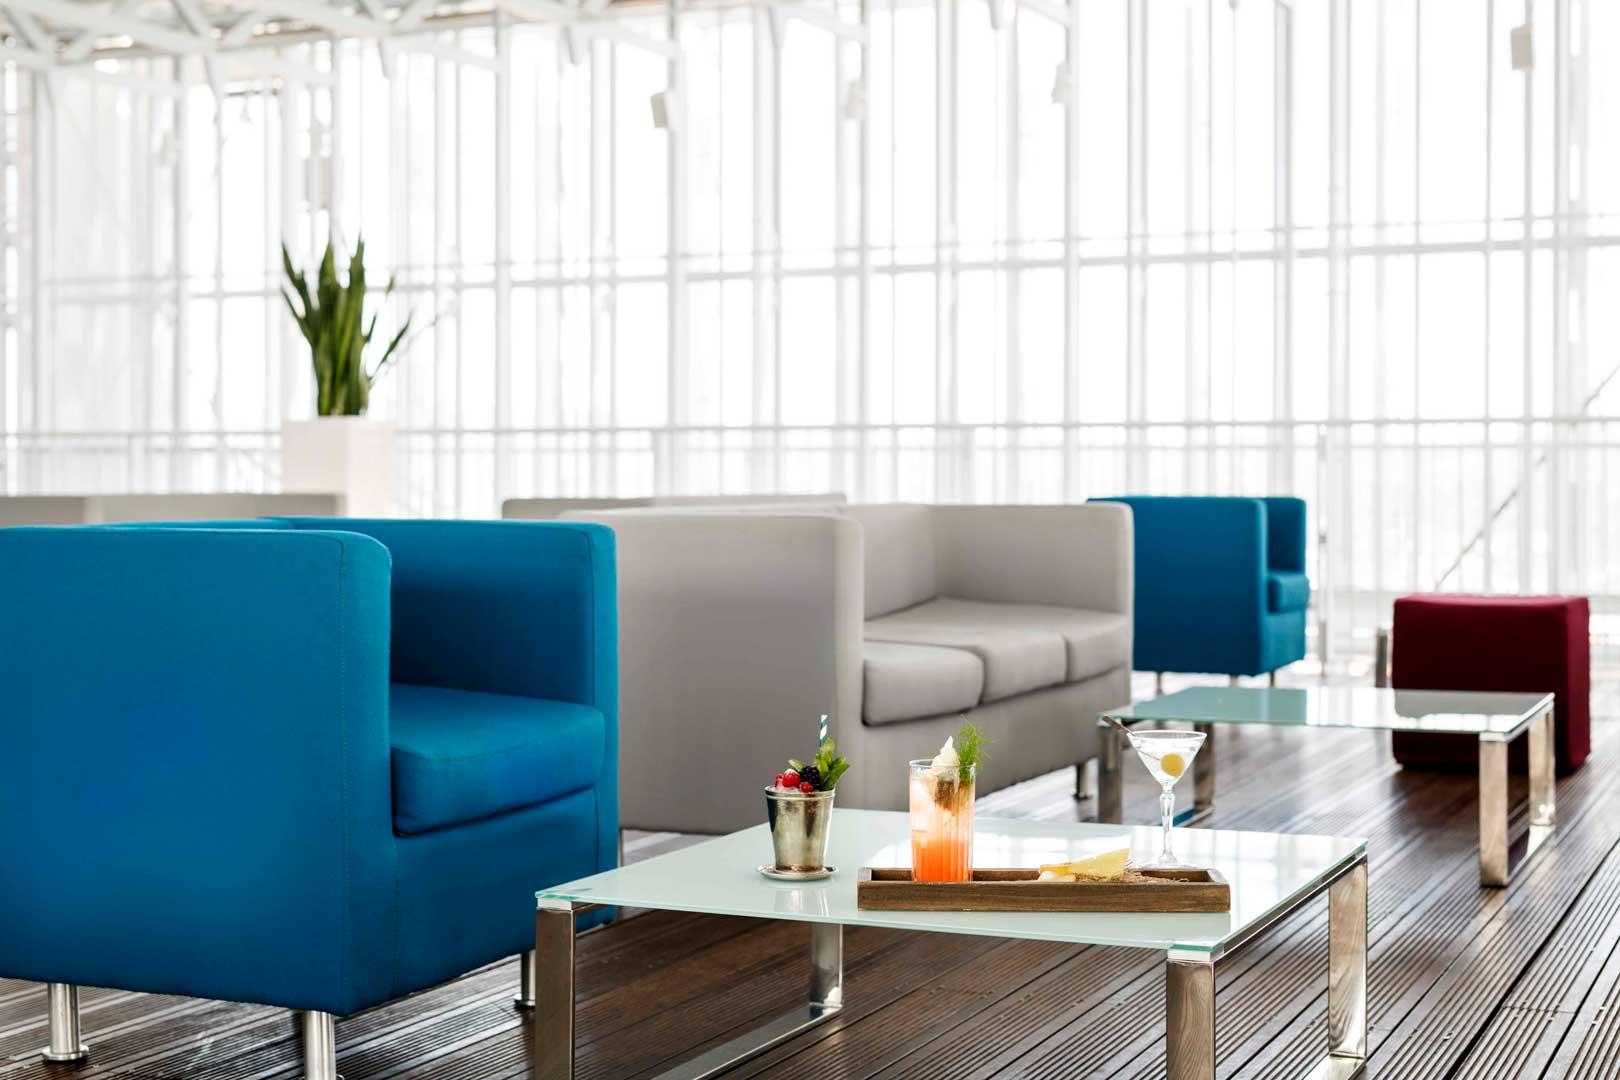 I 10 migliori cocktail bar d'Italia - Piano 35 Lounge Bar